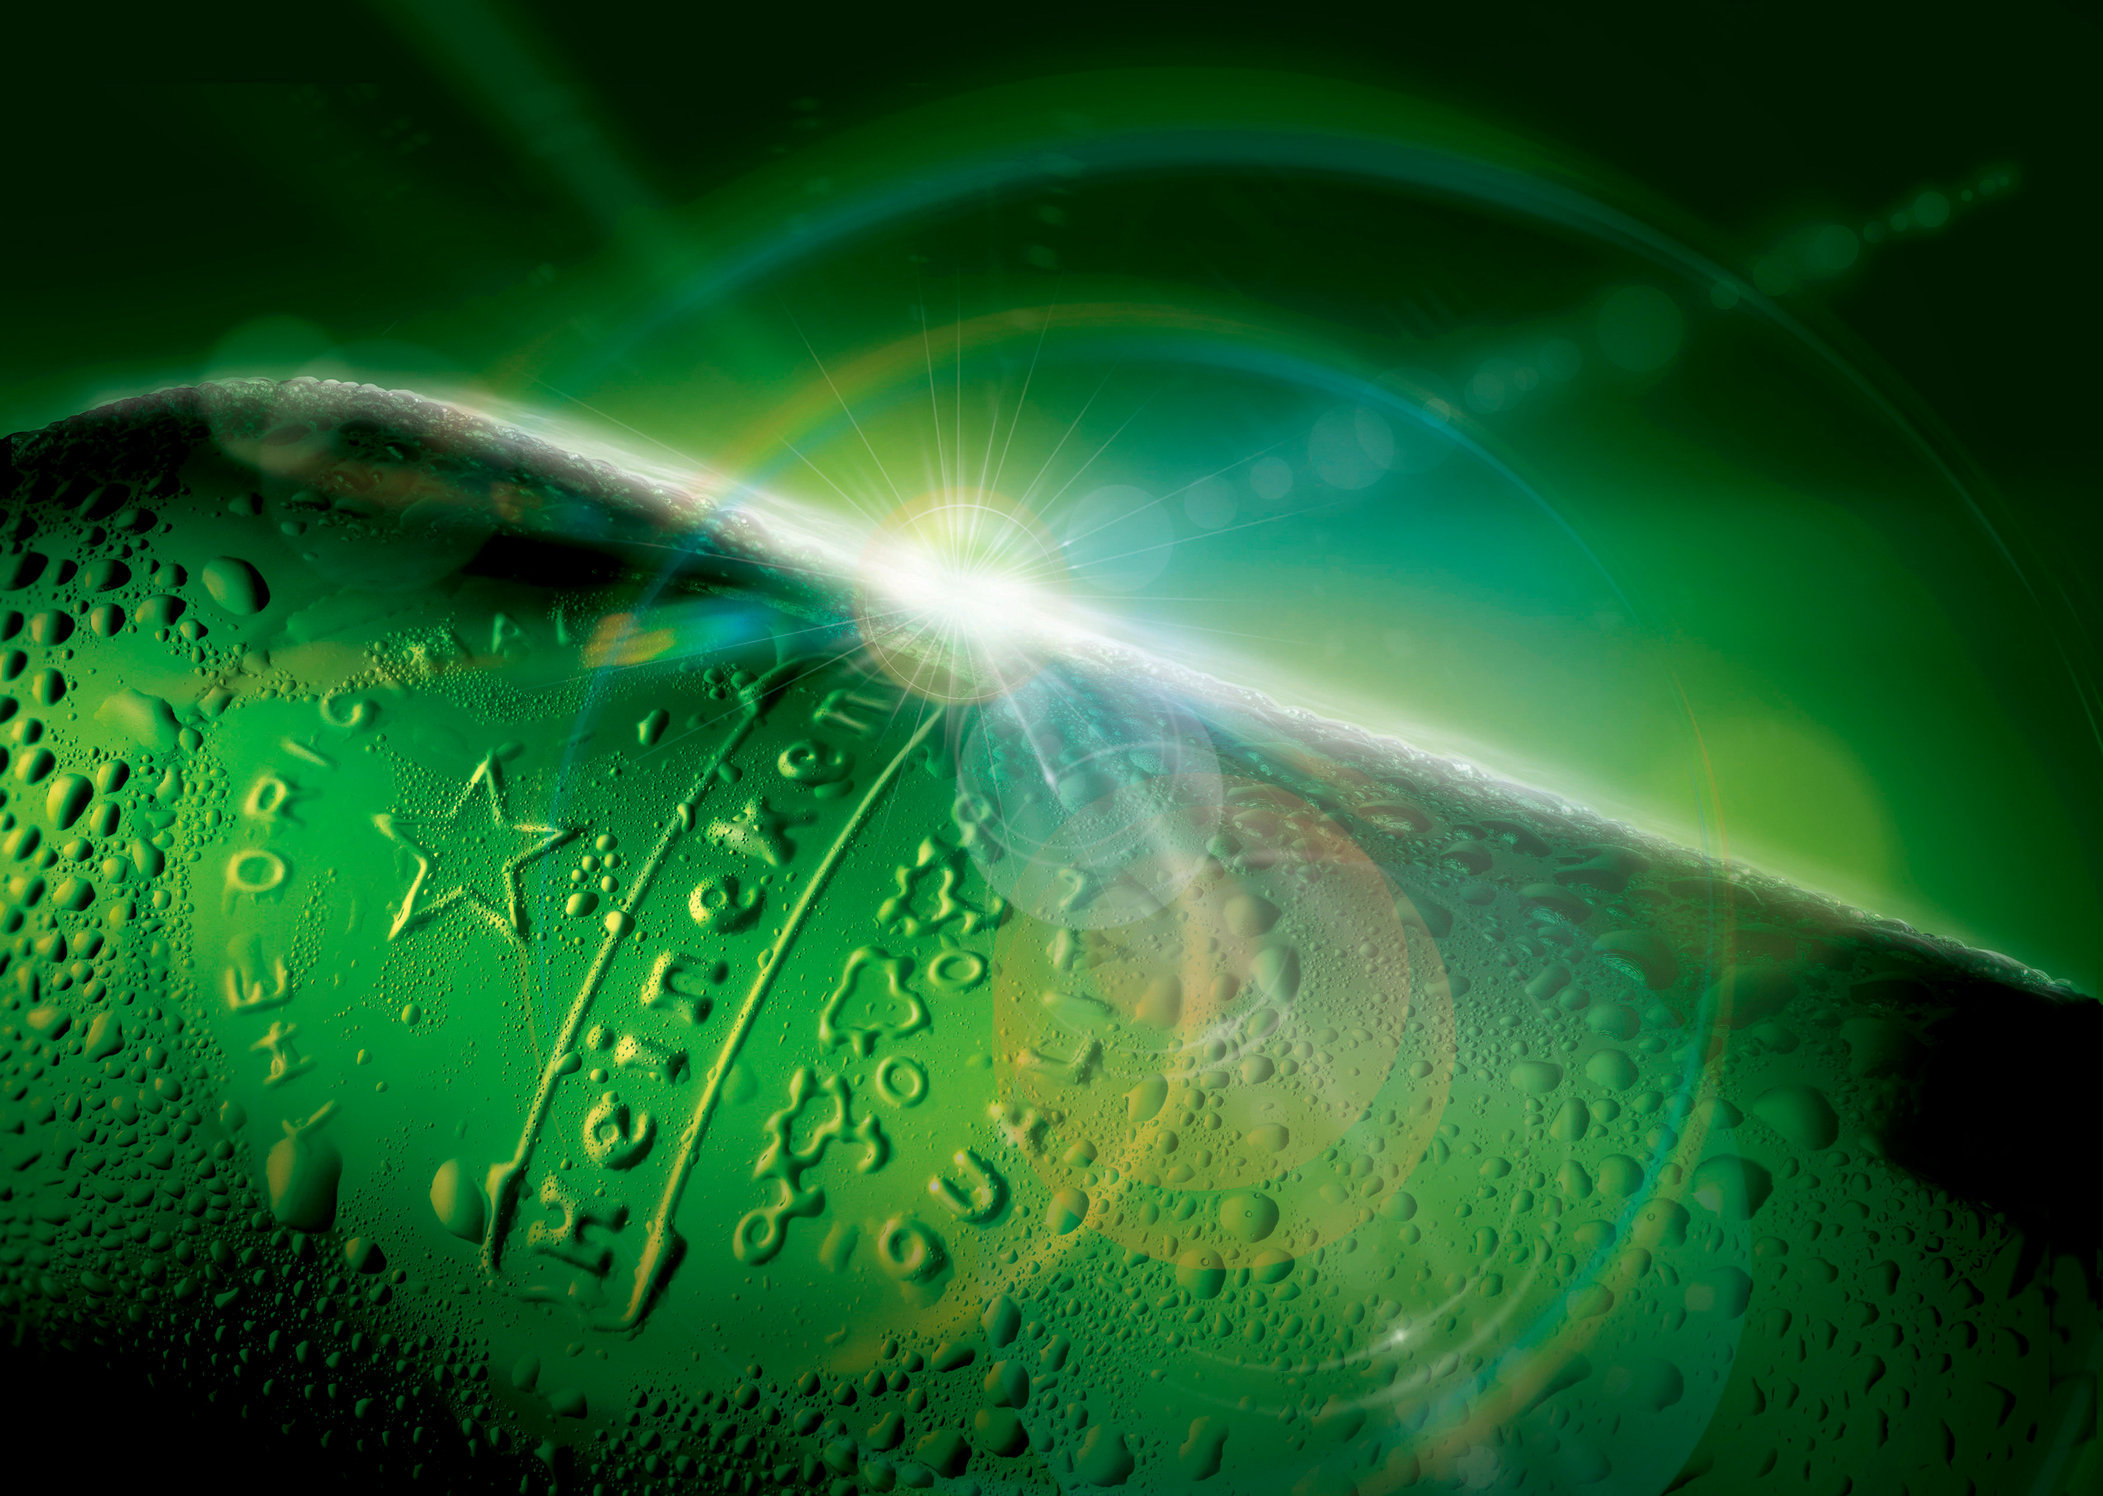 Heineken_Crop_1_rgb.jpg